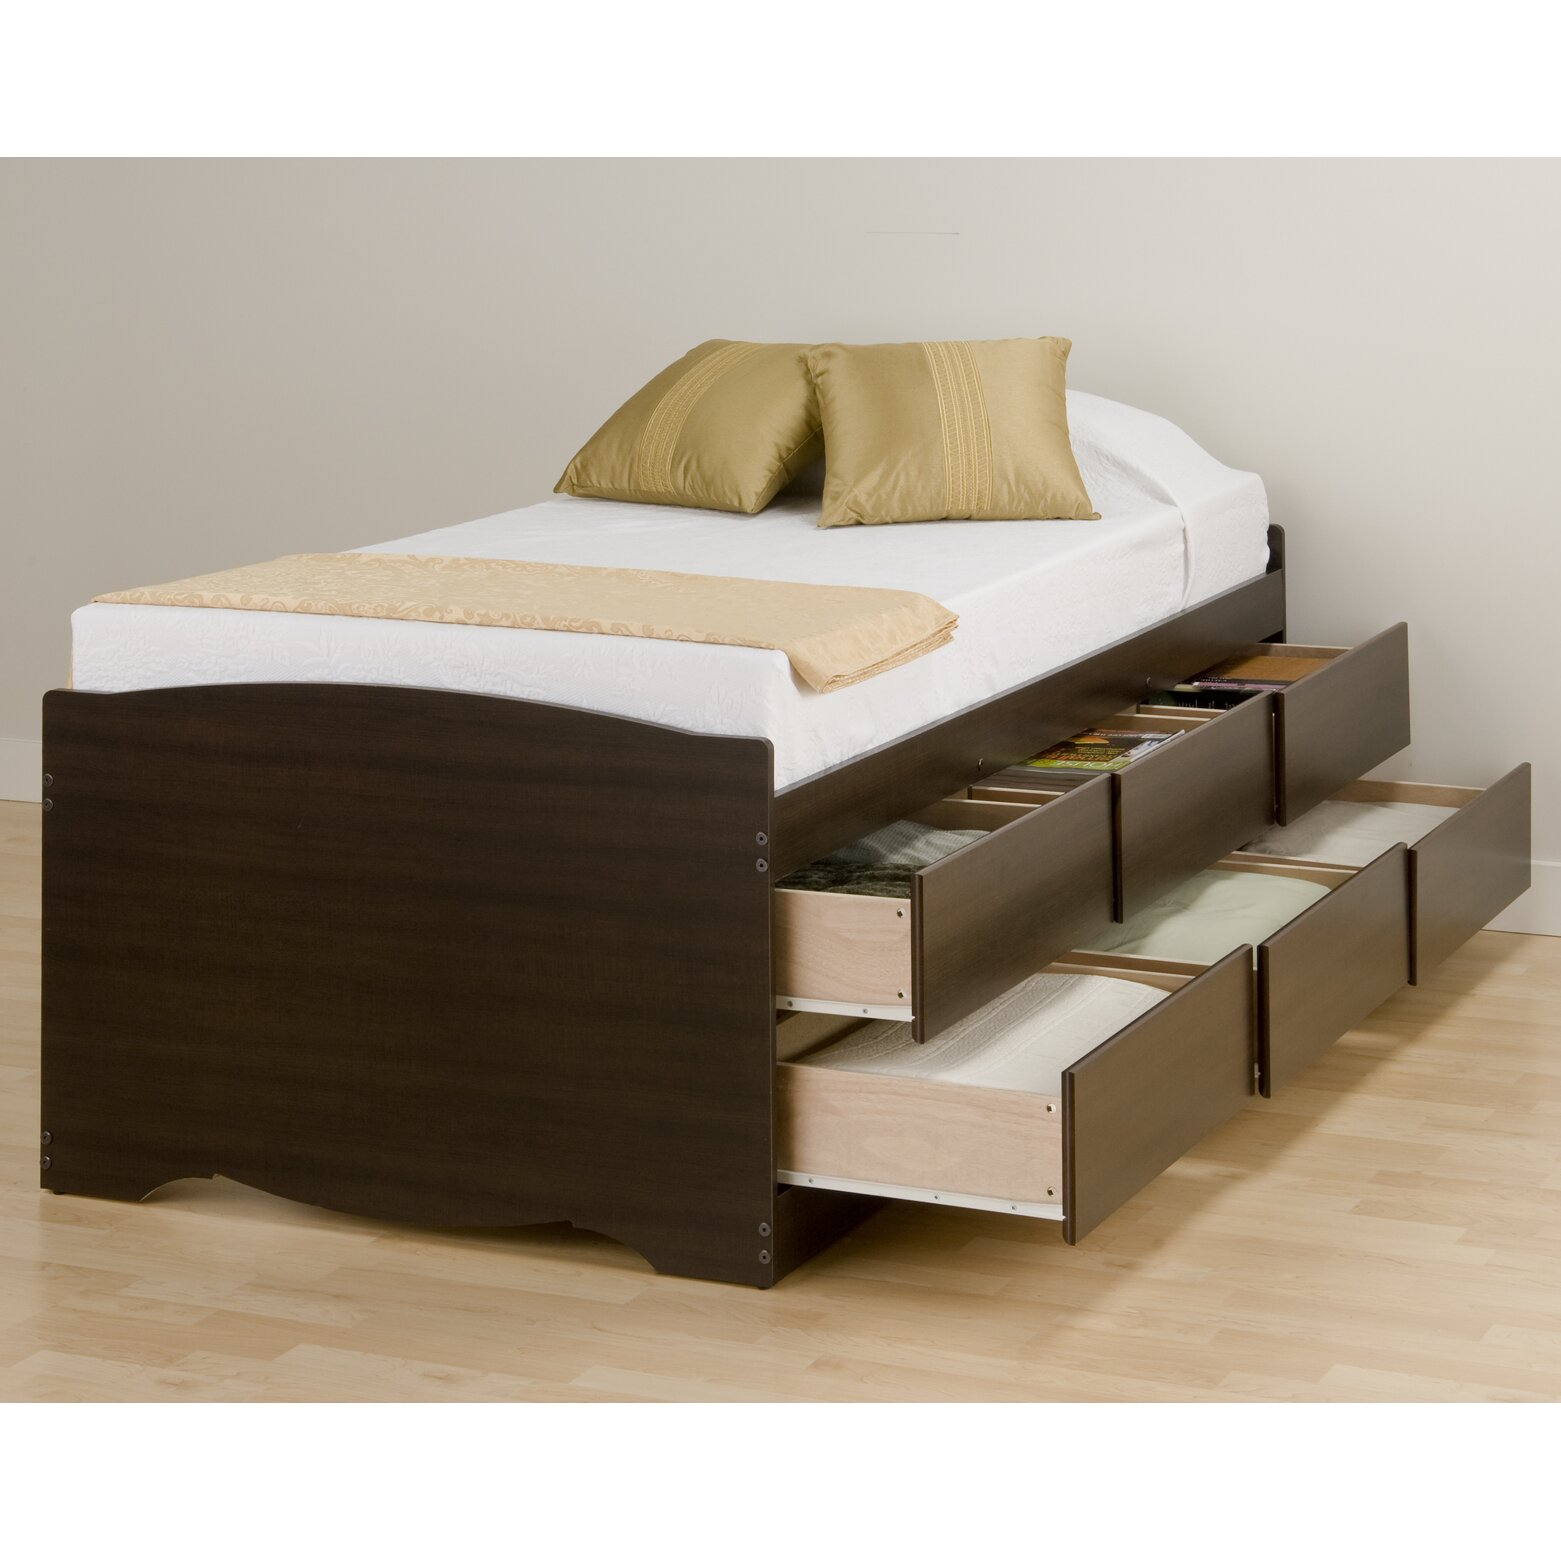 Twin platform beds with storage - Latitude Run Wanda Twin Platform Bed With Storage Reviews Wayfair